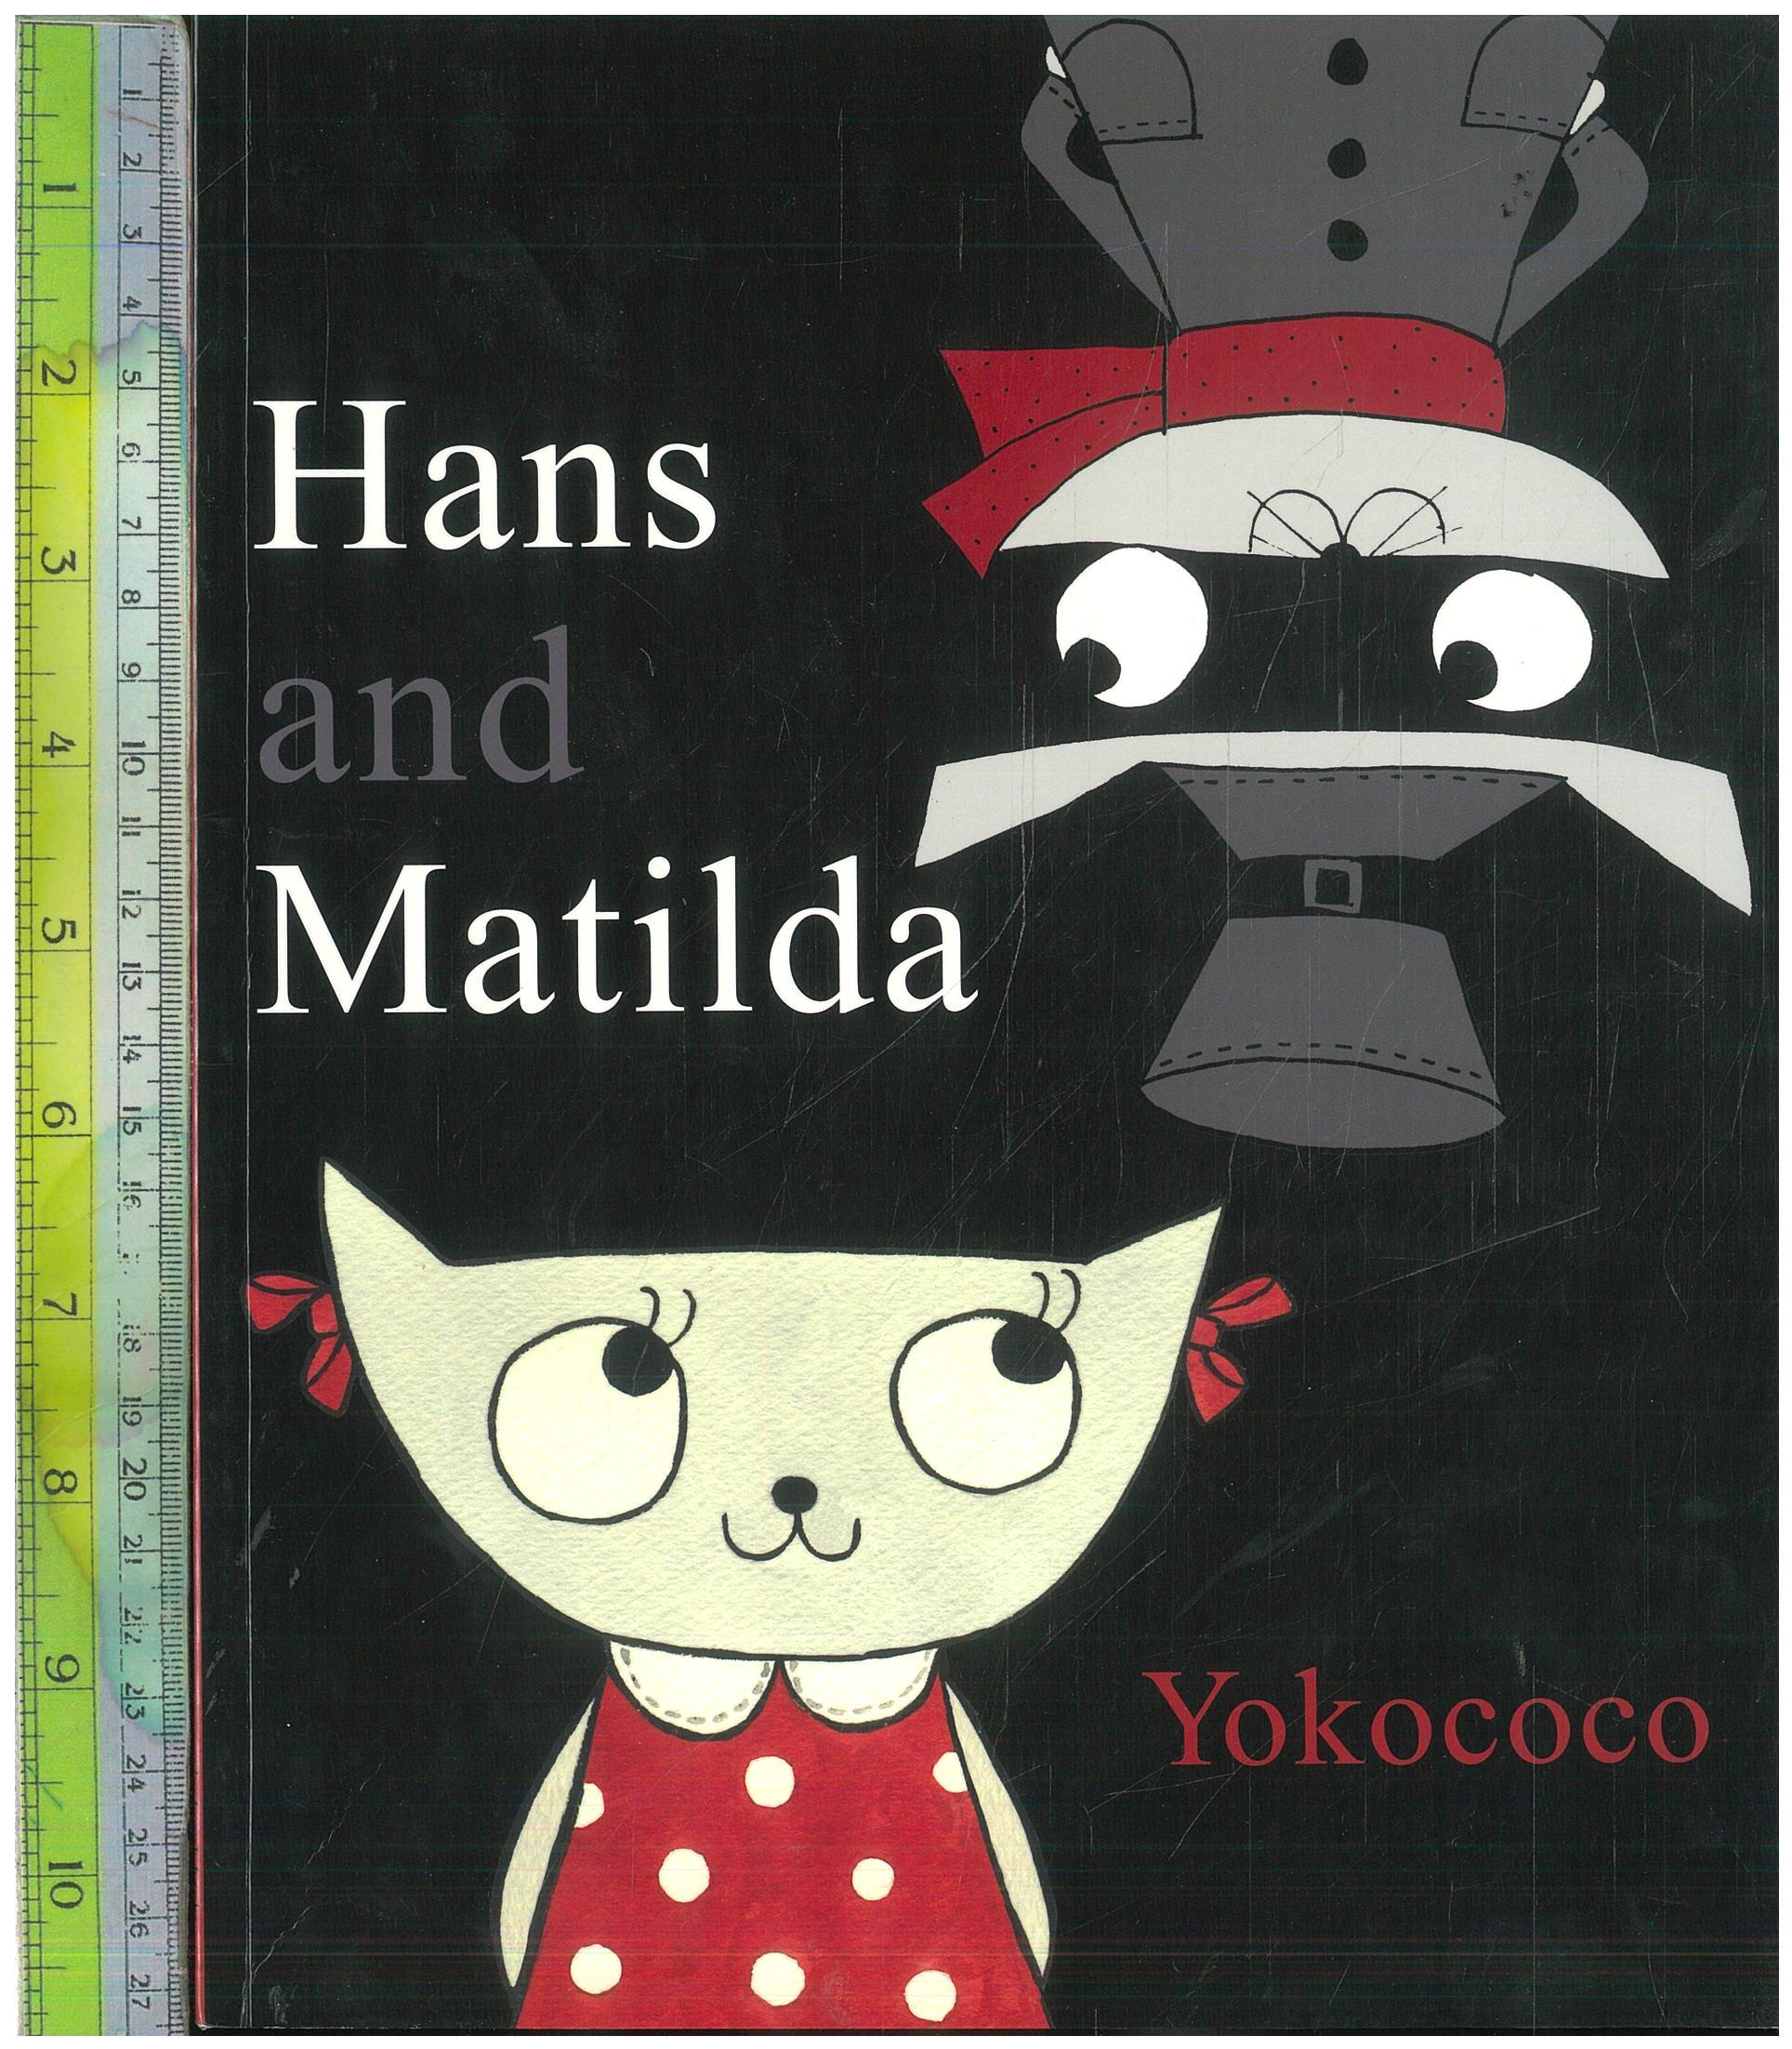 Hans and matida